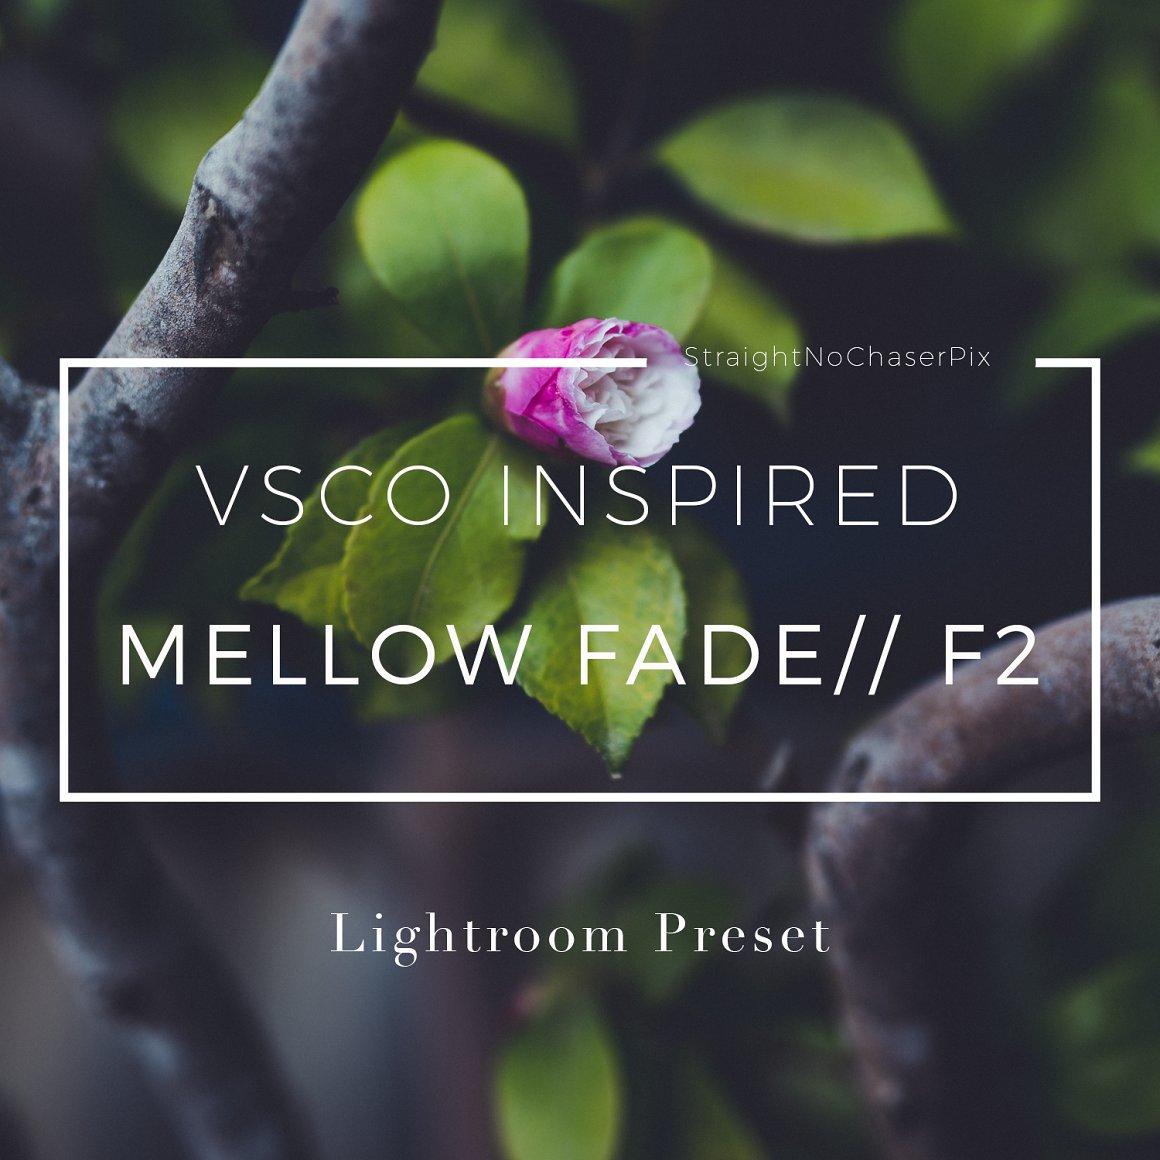 VSCOCam F2 inspired Lightroom Preset